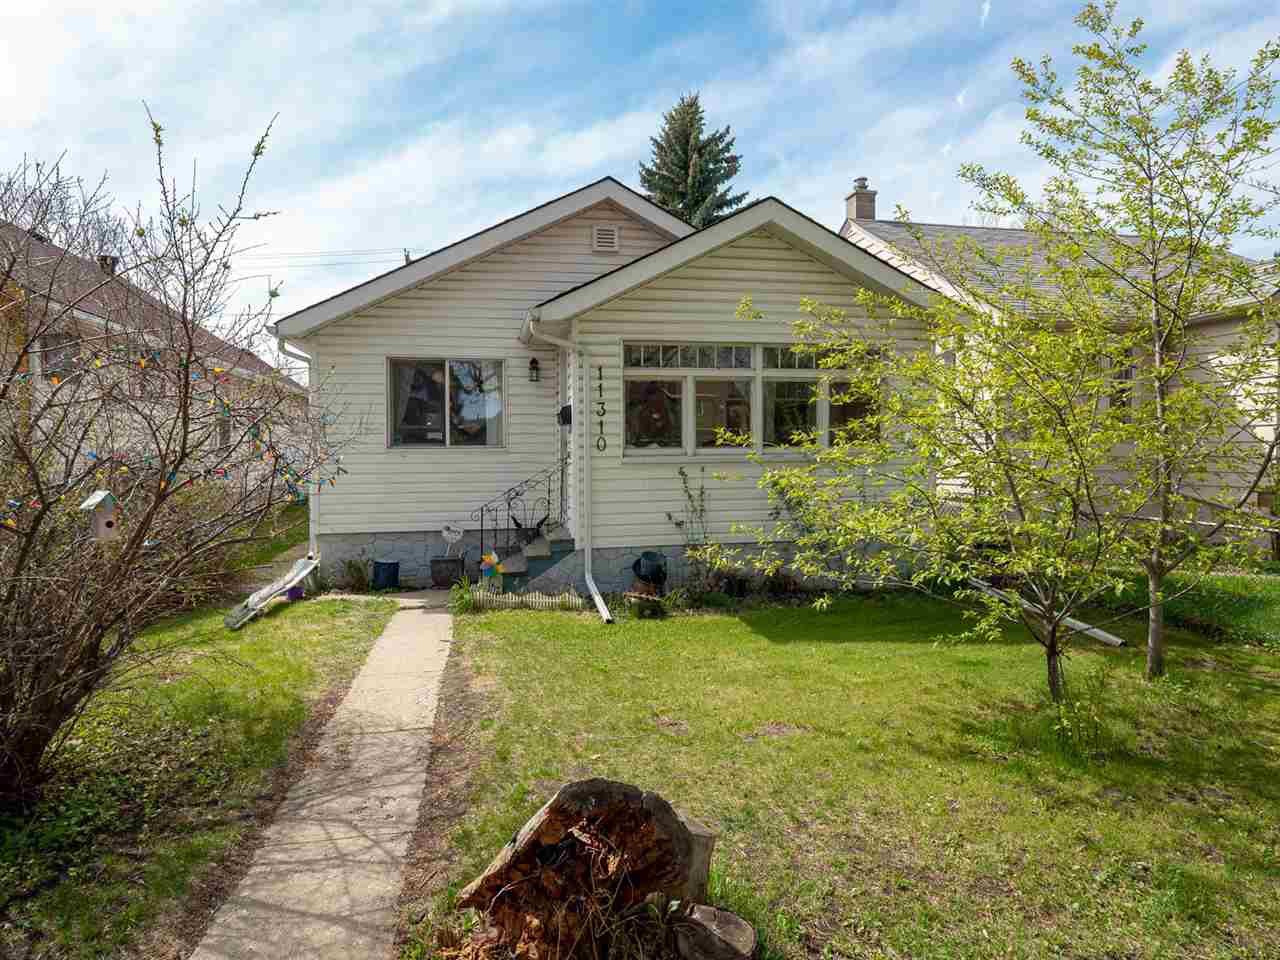 Main Photo: 11310 96 Street in Edmonton: Zone 05 House for sale : MLS®# E4187300